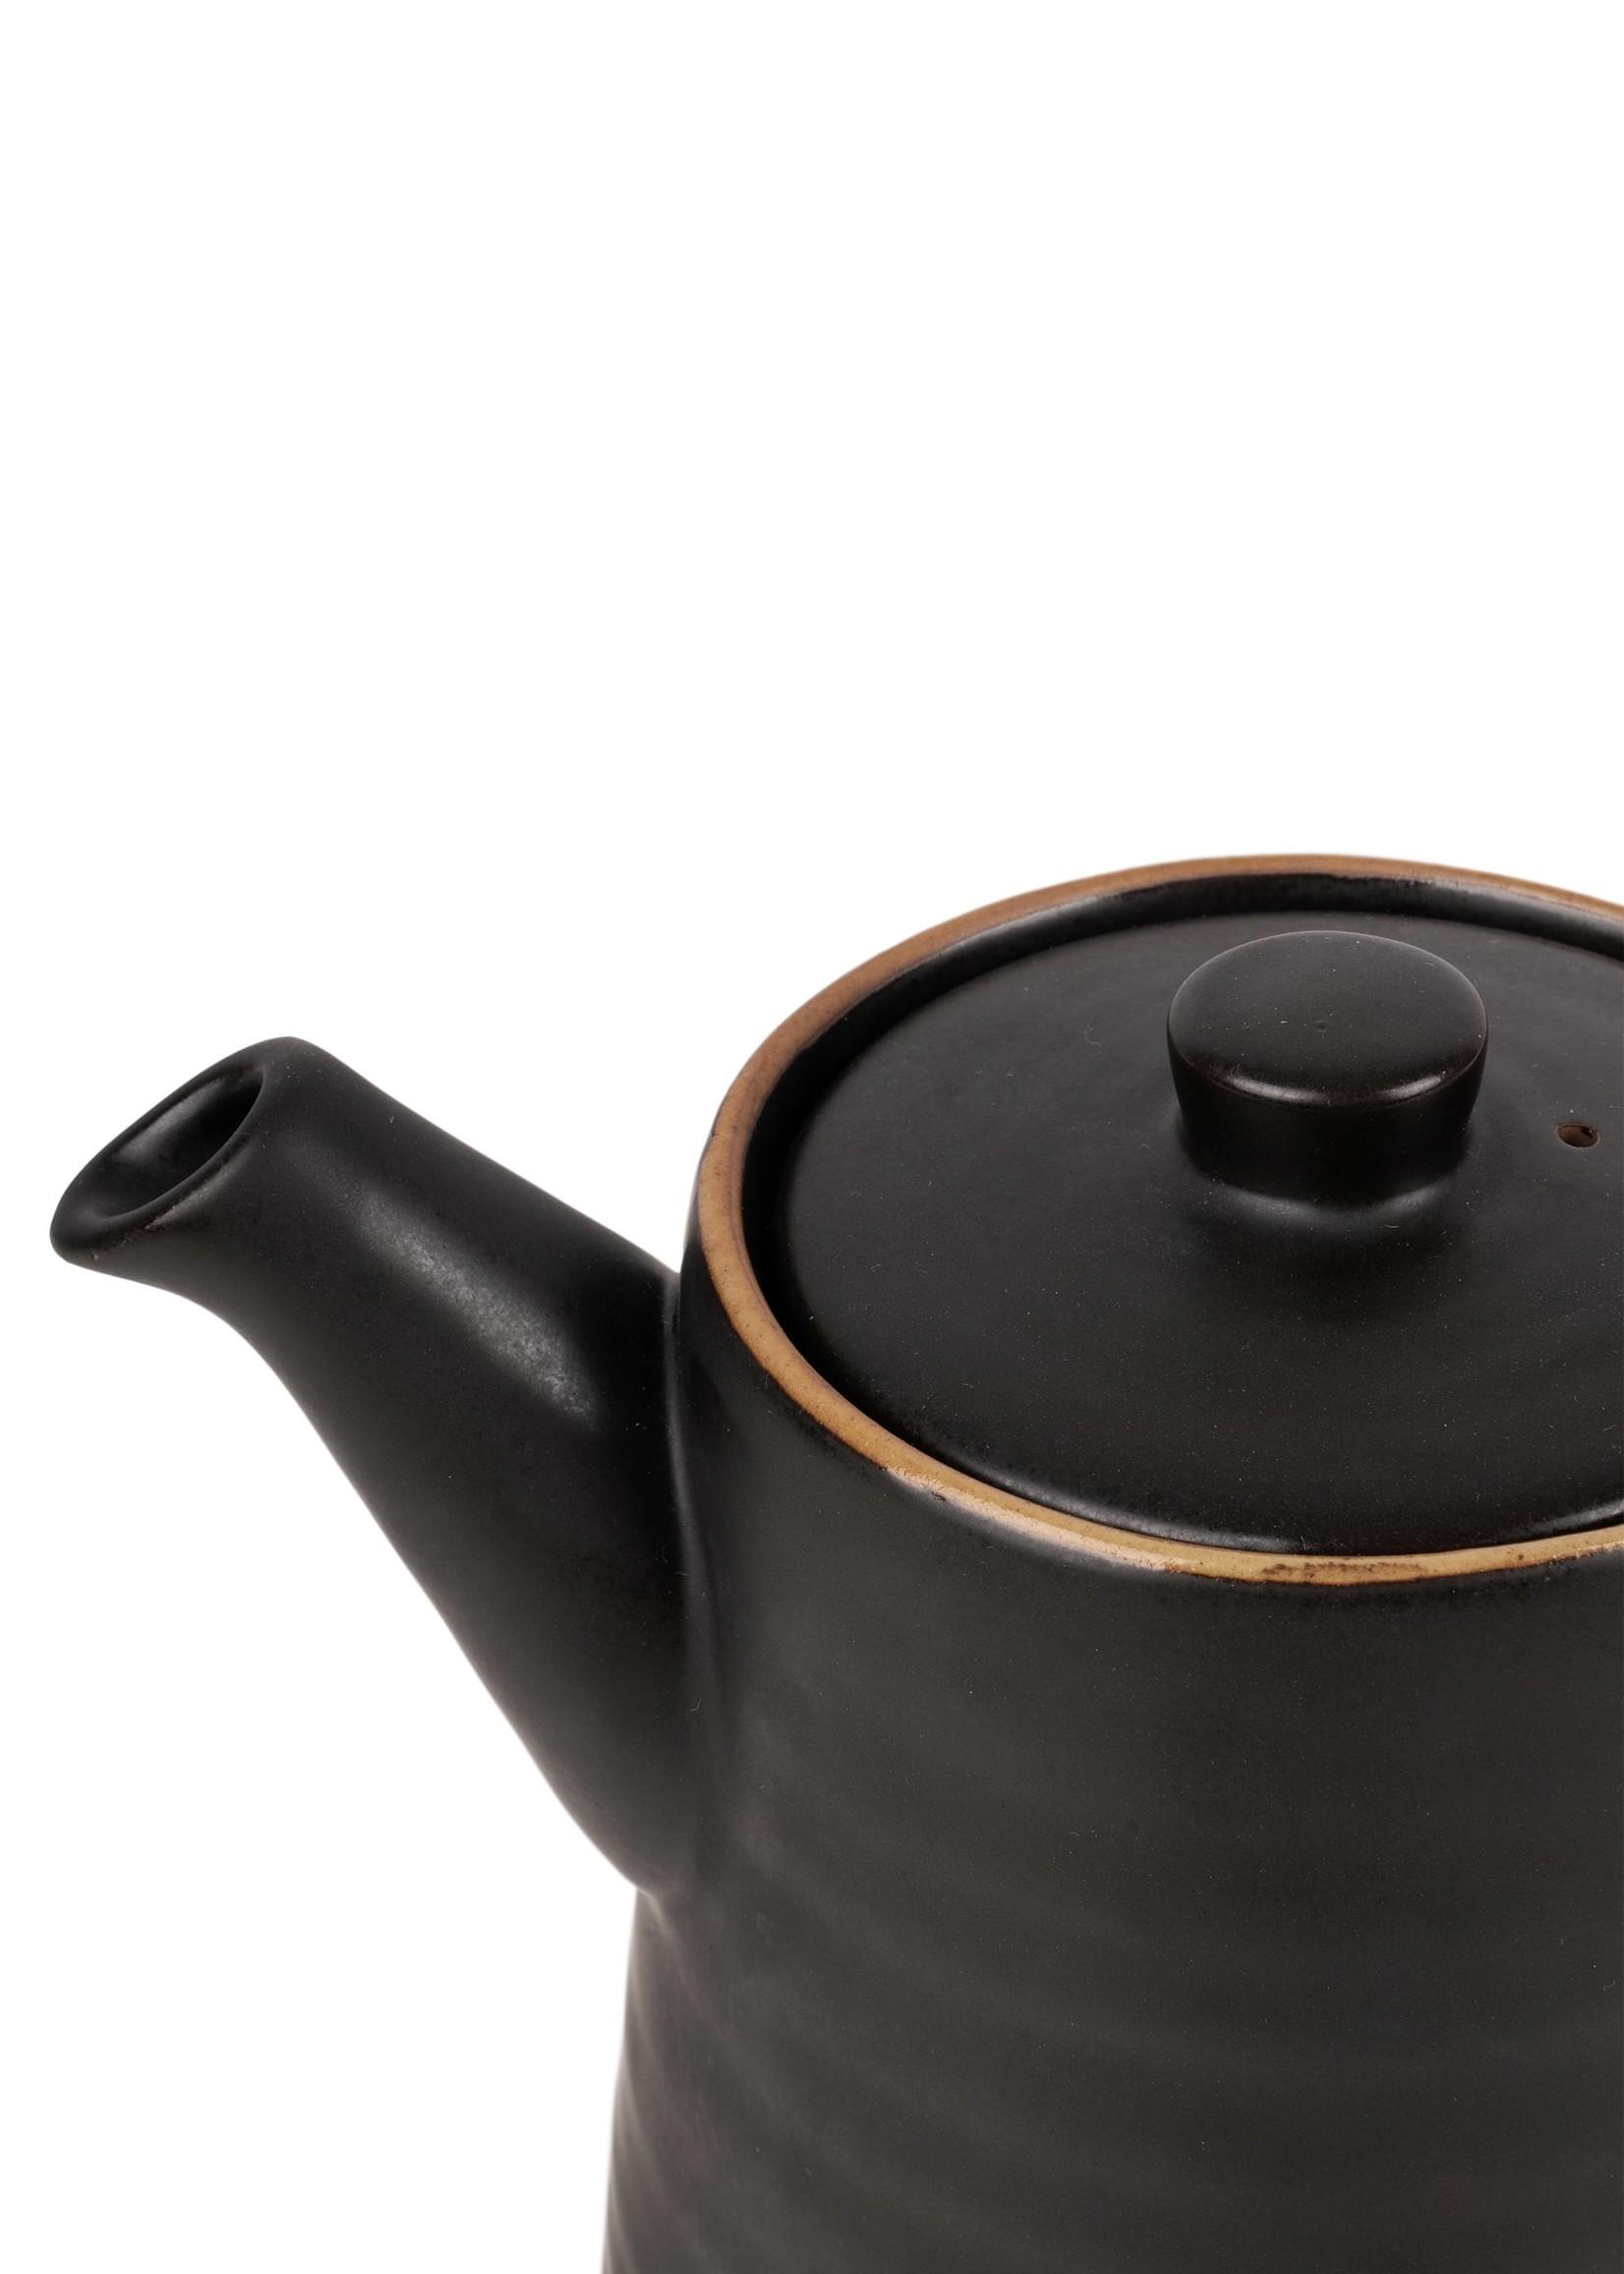 ZUSSS theepot aardewerk 1.25l zwart